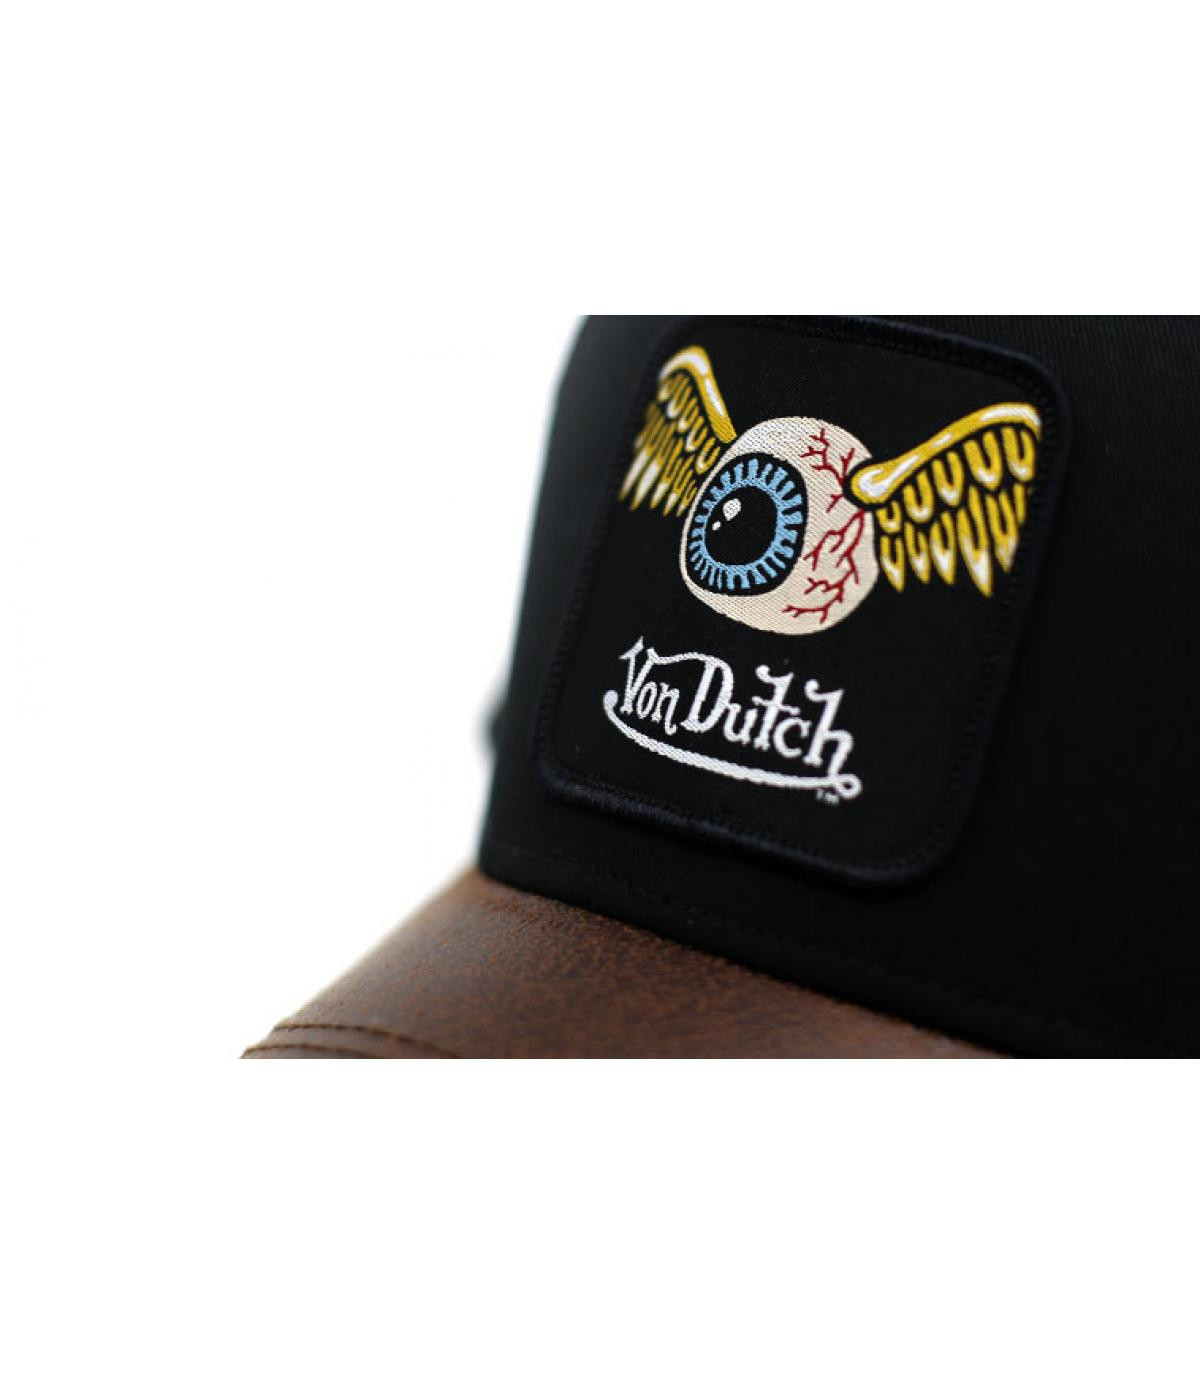 Dettagli Trucker Eye Patch black brown - image 3